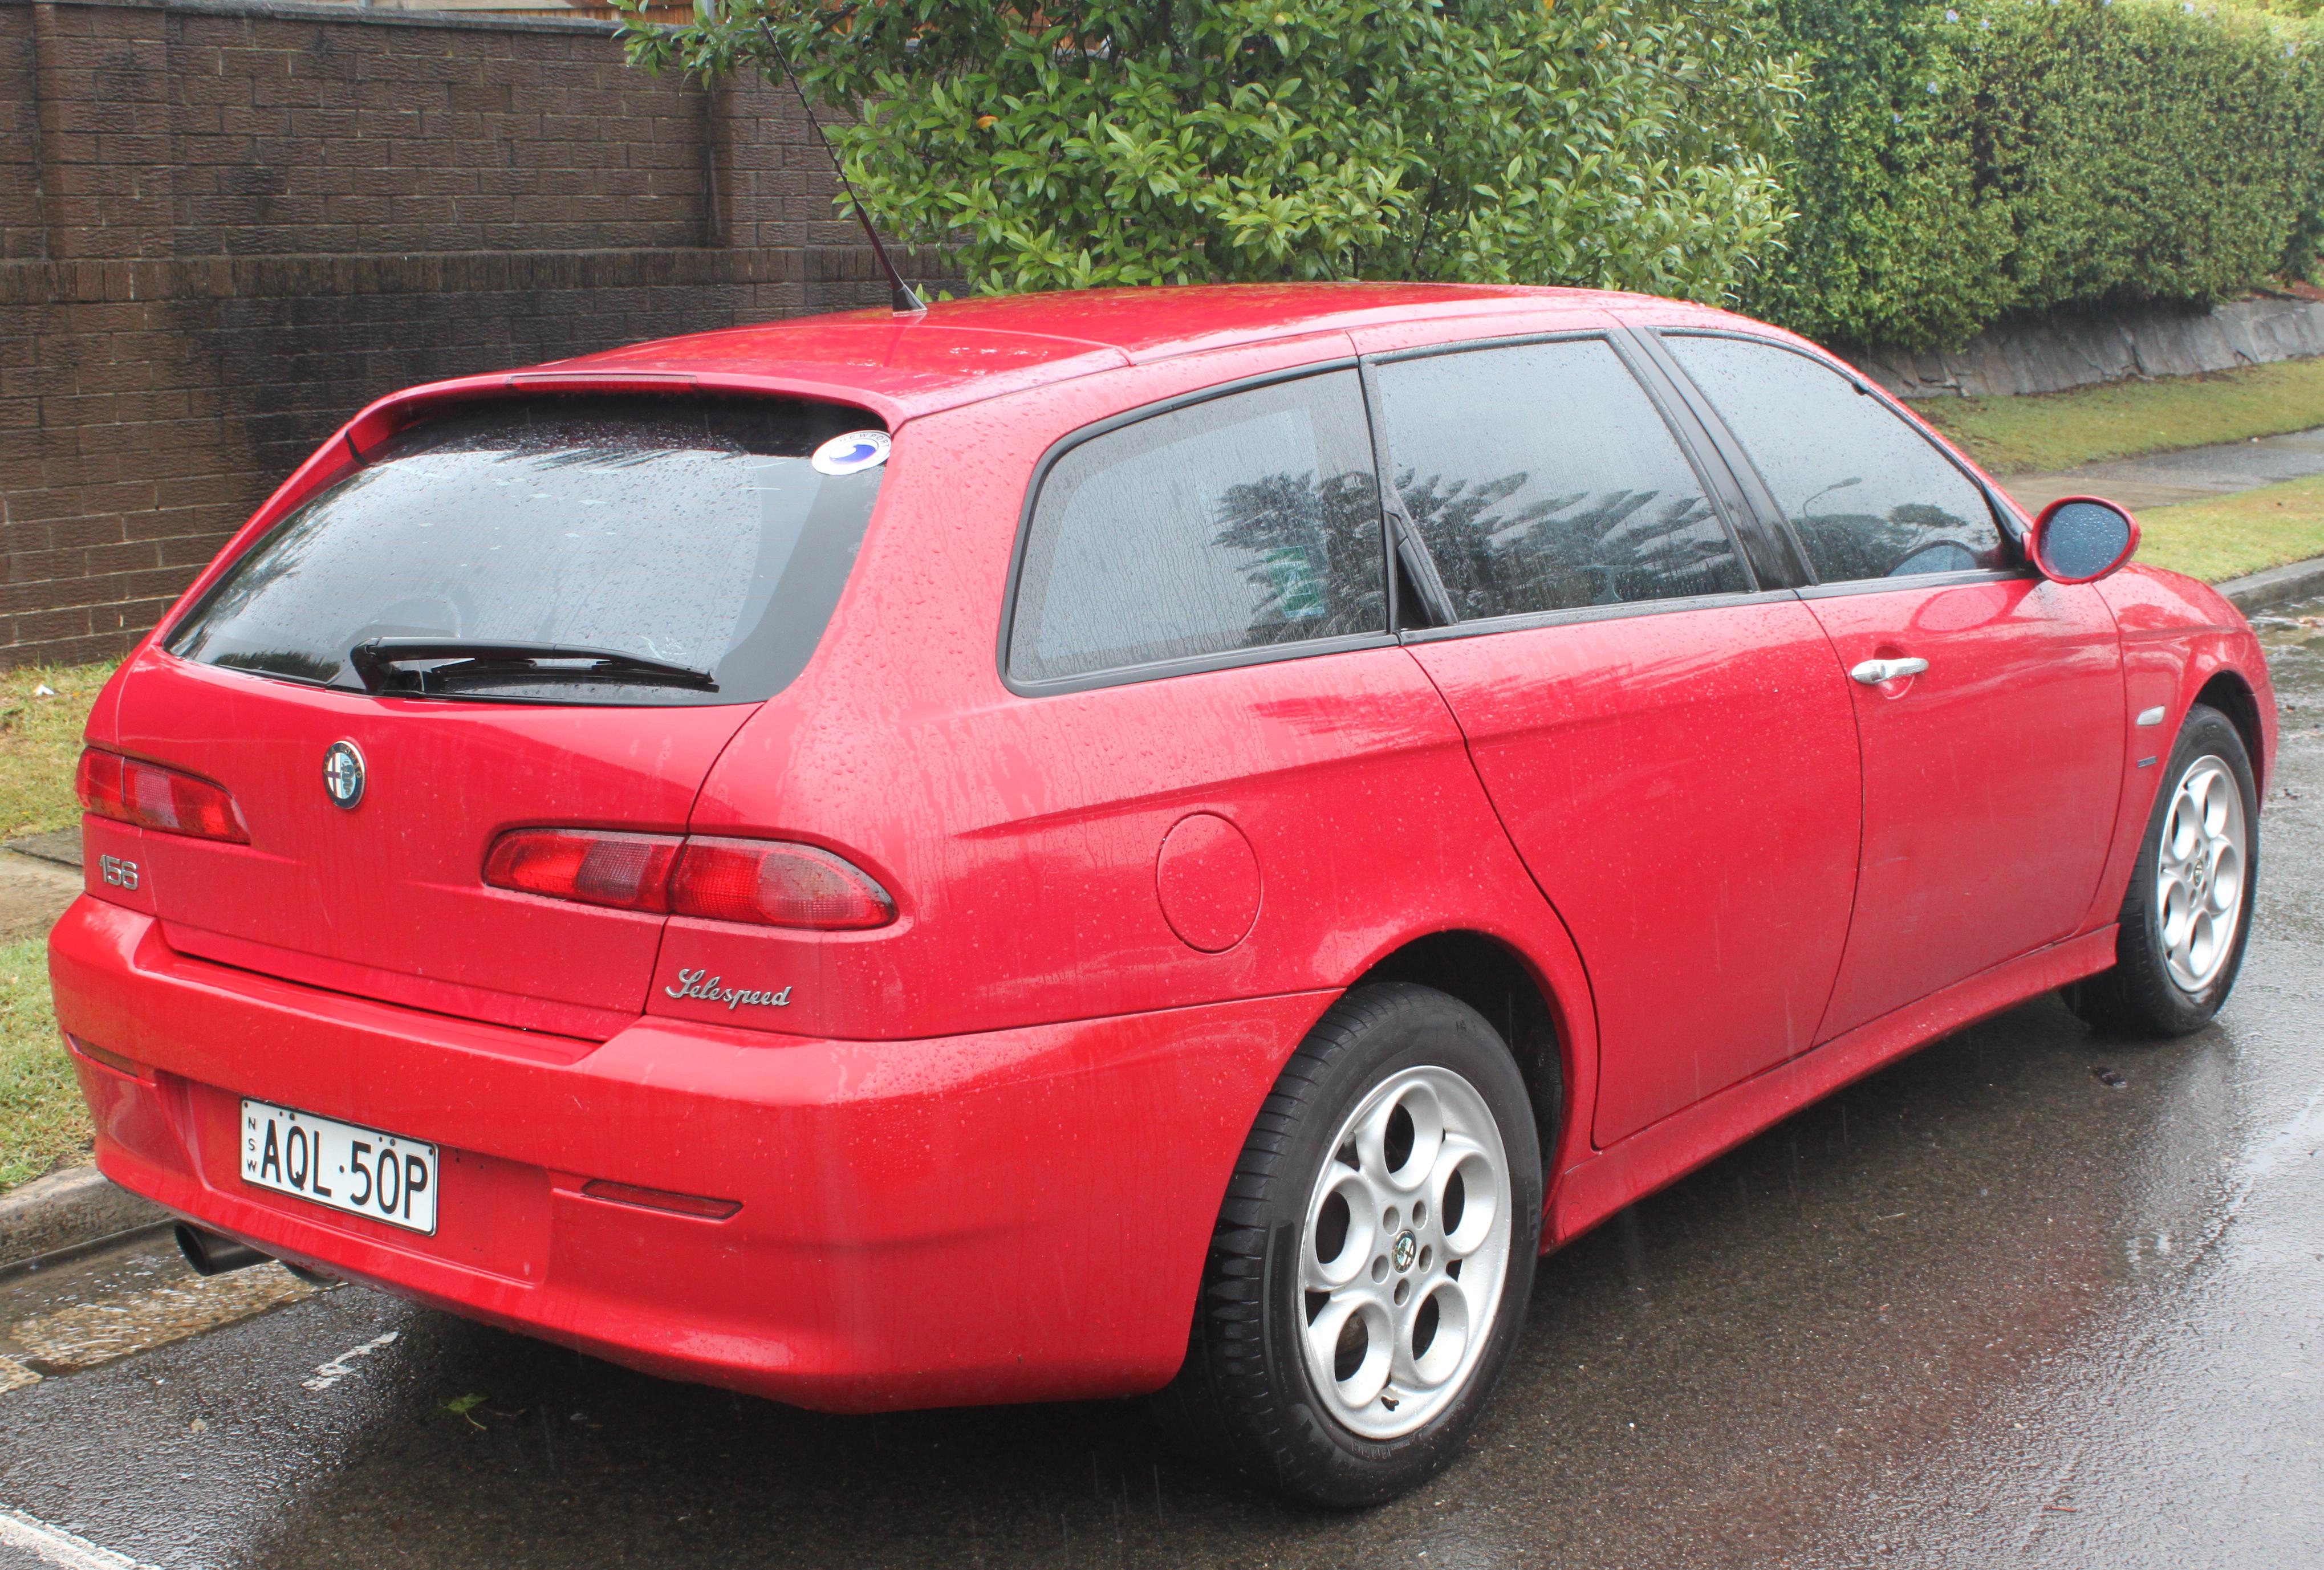 Alfa Romeo 156 I Restyling 2 2003 - 2007 Station wagon 5 door #3